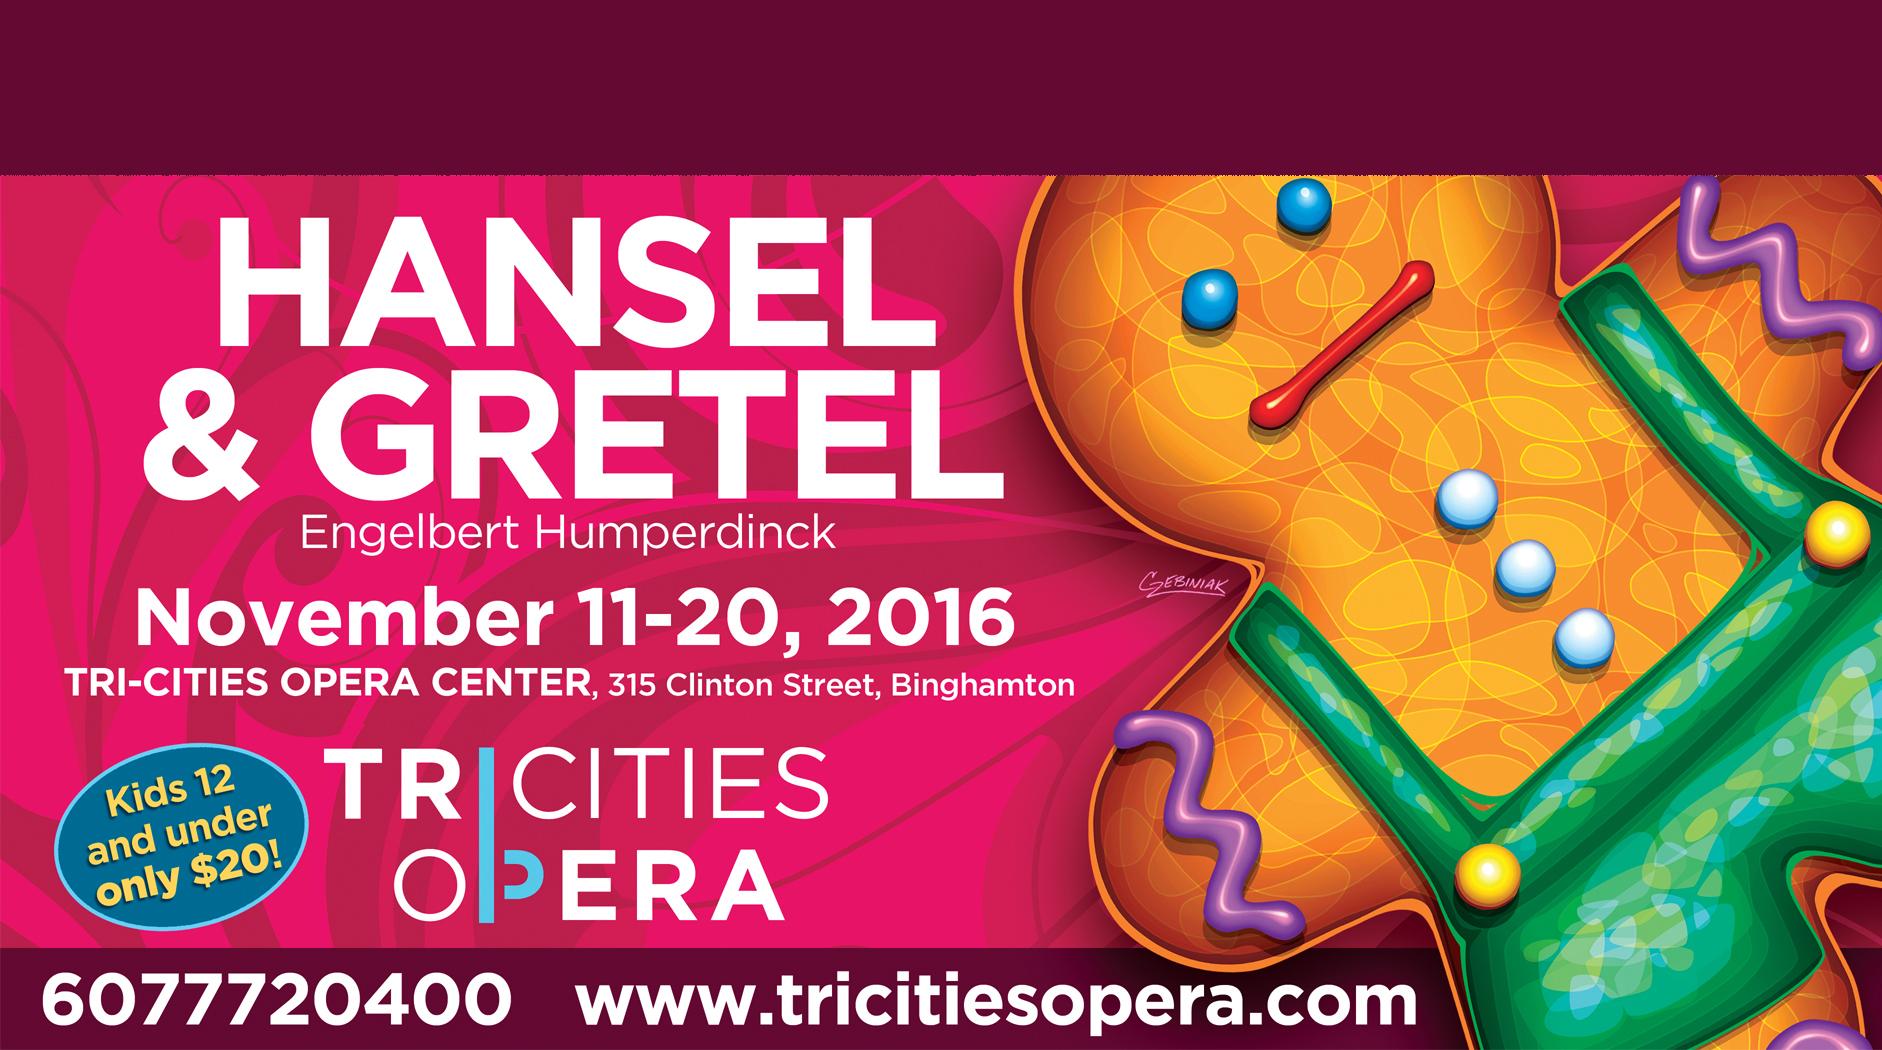 hansel-gretel-homepage-image